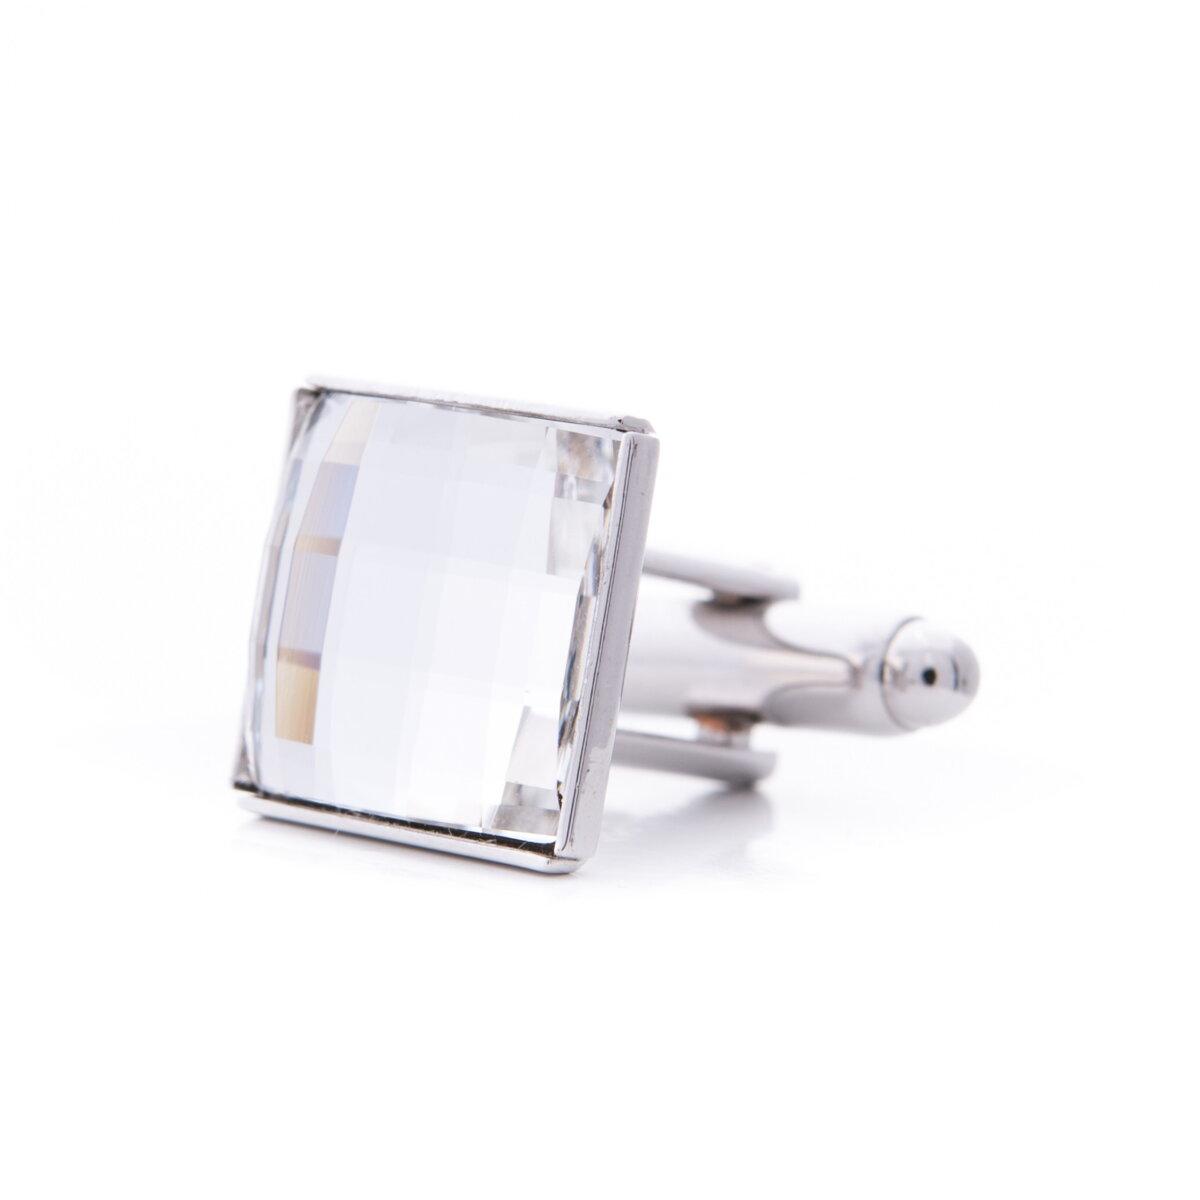 680d7810b Manžetové gombíky so Swarovski® kameňmi - Crystal | Krabička v cene